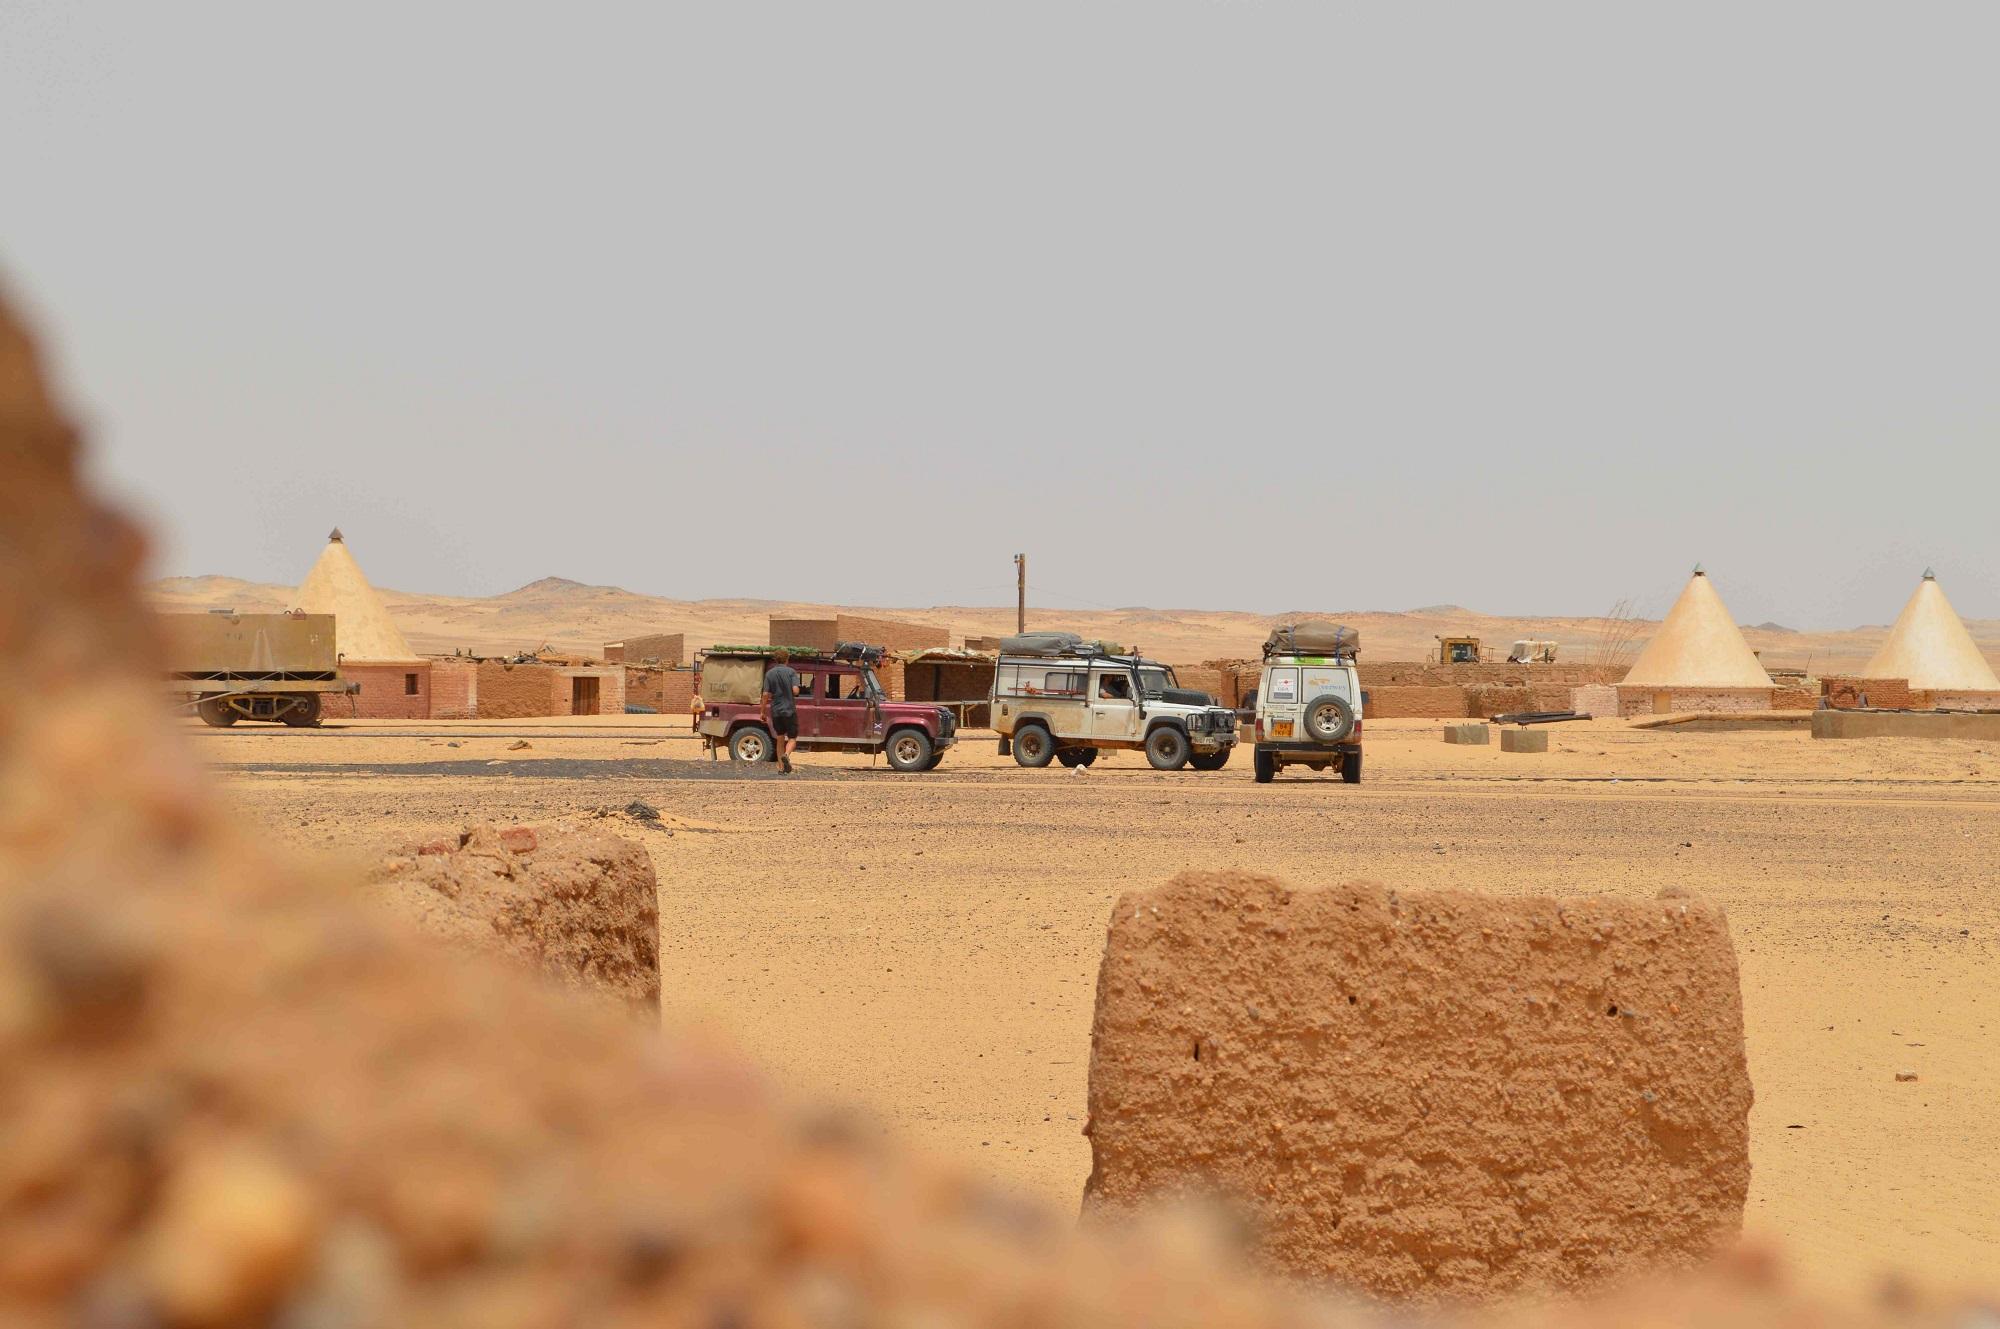 2014-CMCPHERSON-SUDAN-16